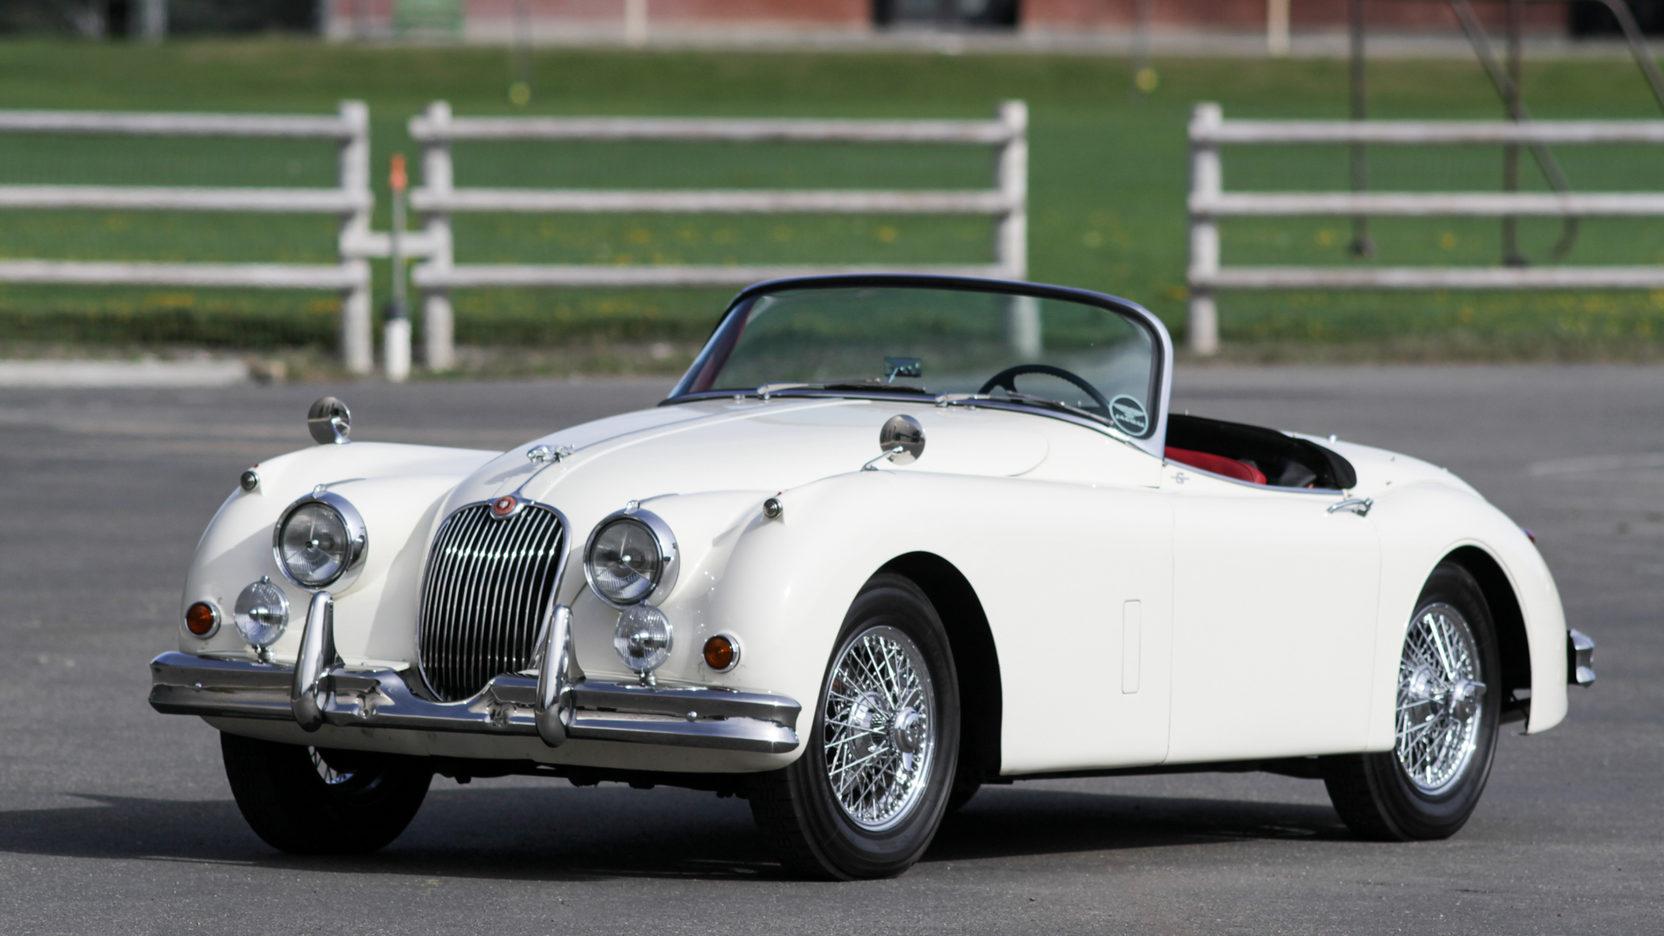 medium resolution of 1960 jaguar xk150 s roadster f95 monterey 2017 jaguar xk150 wiring harness